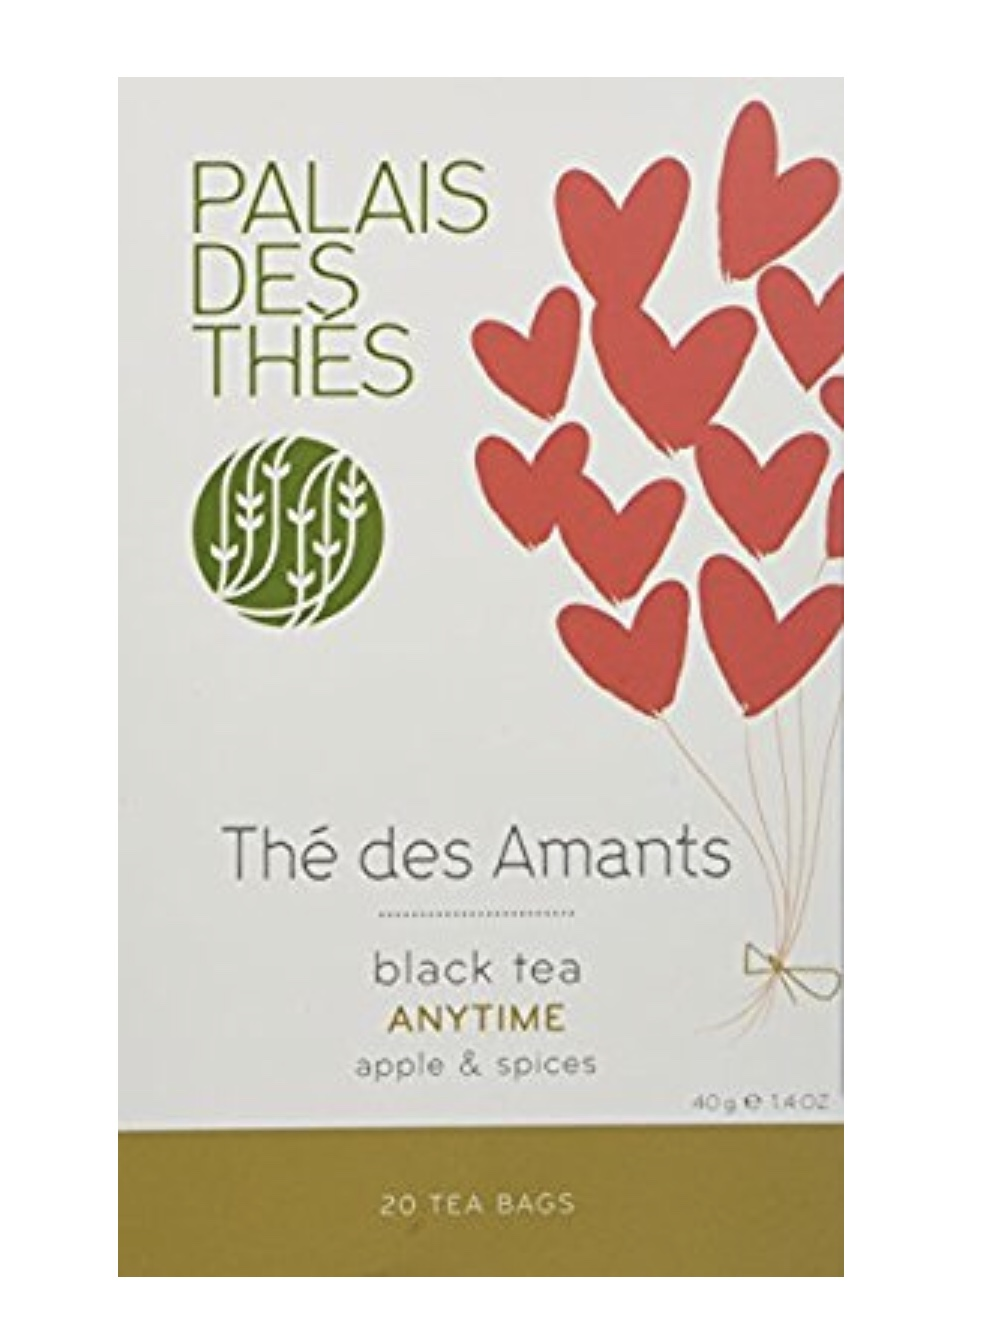 Palais Des Thes, The des Amants, Anytime Black Tea, Apple and Spices